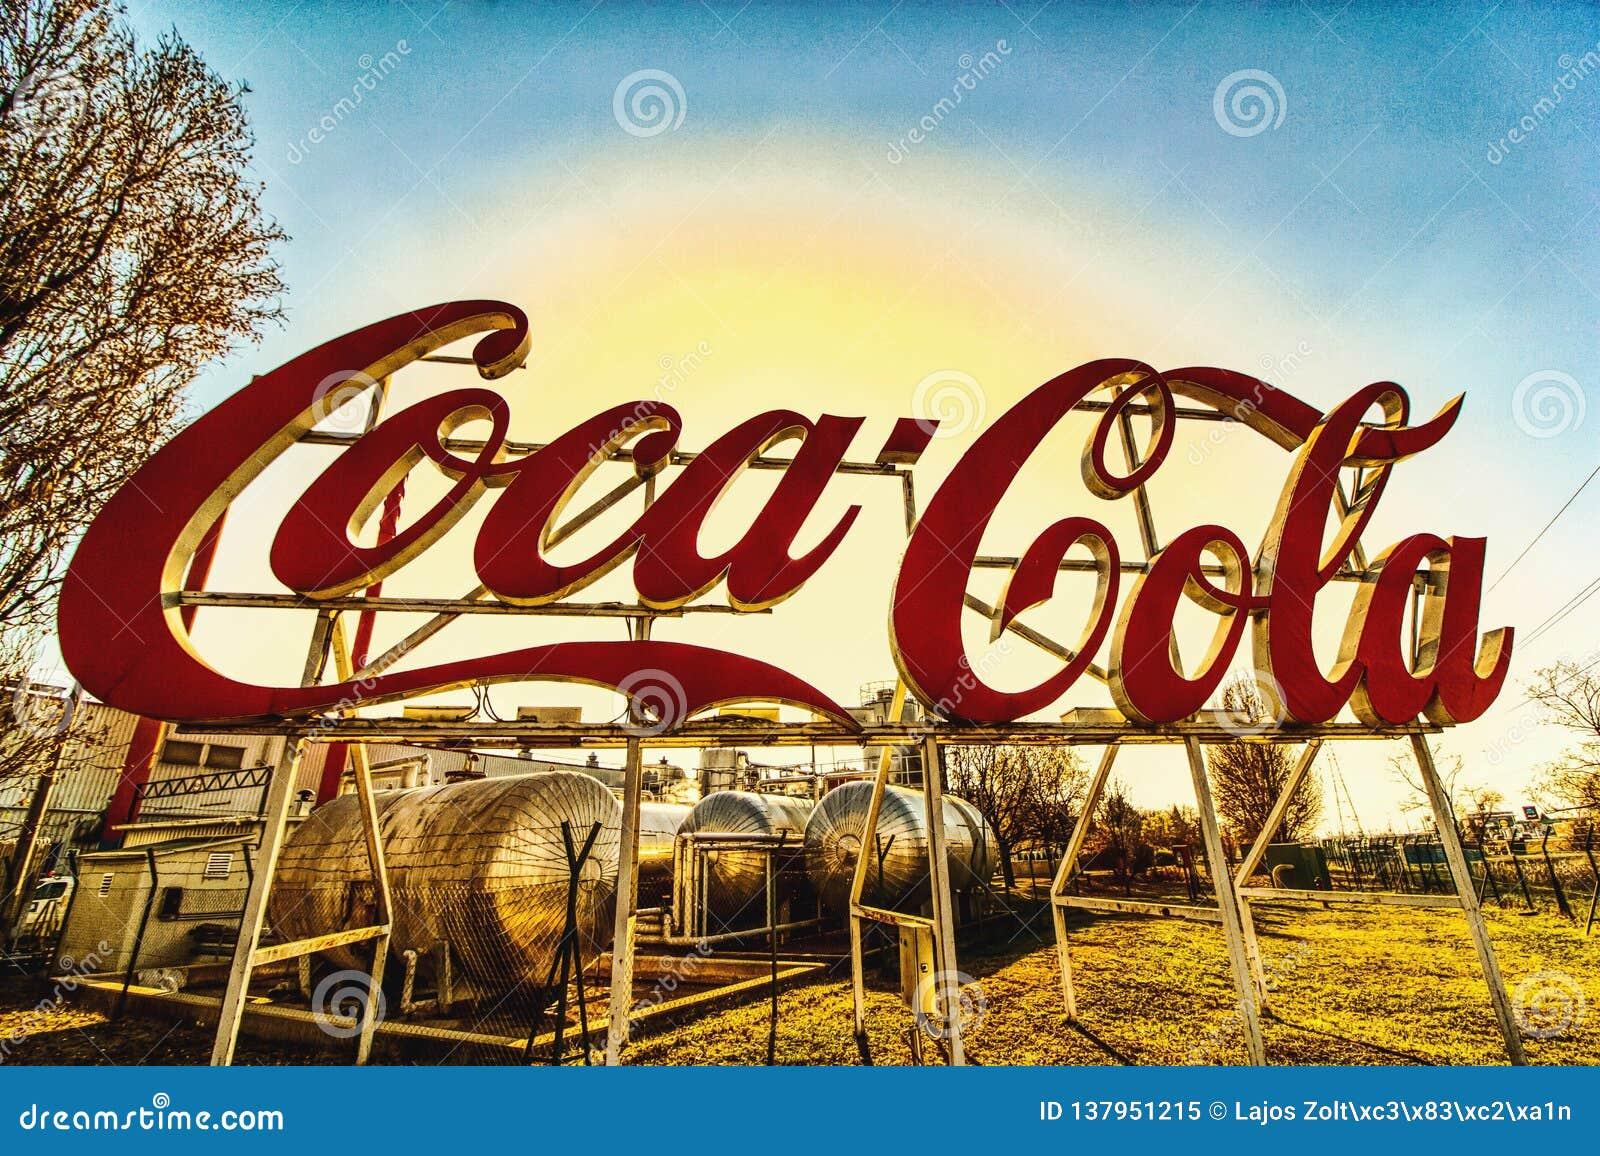 Coca - colaUngern